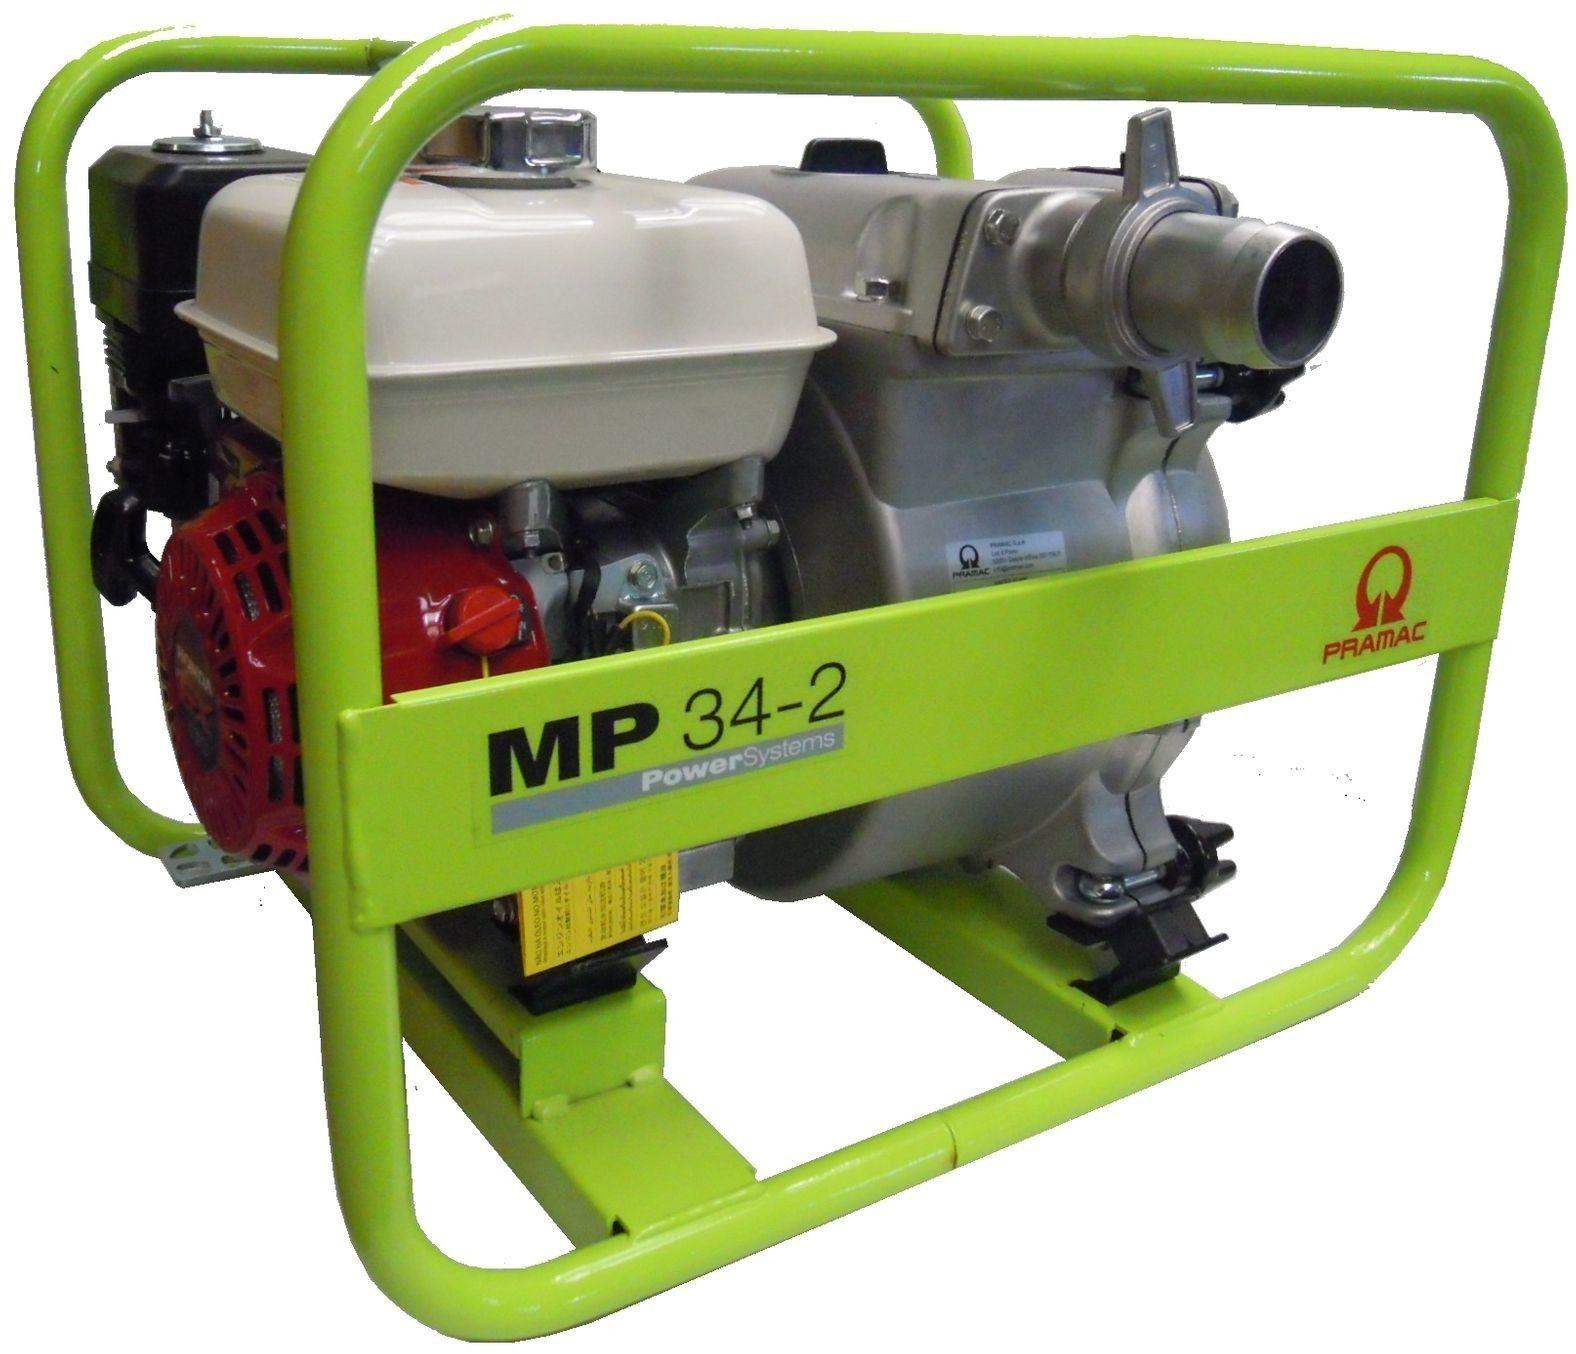 Motopompa do brudnej wody Pramac MP 34-2